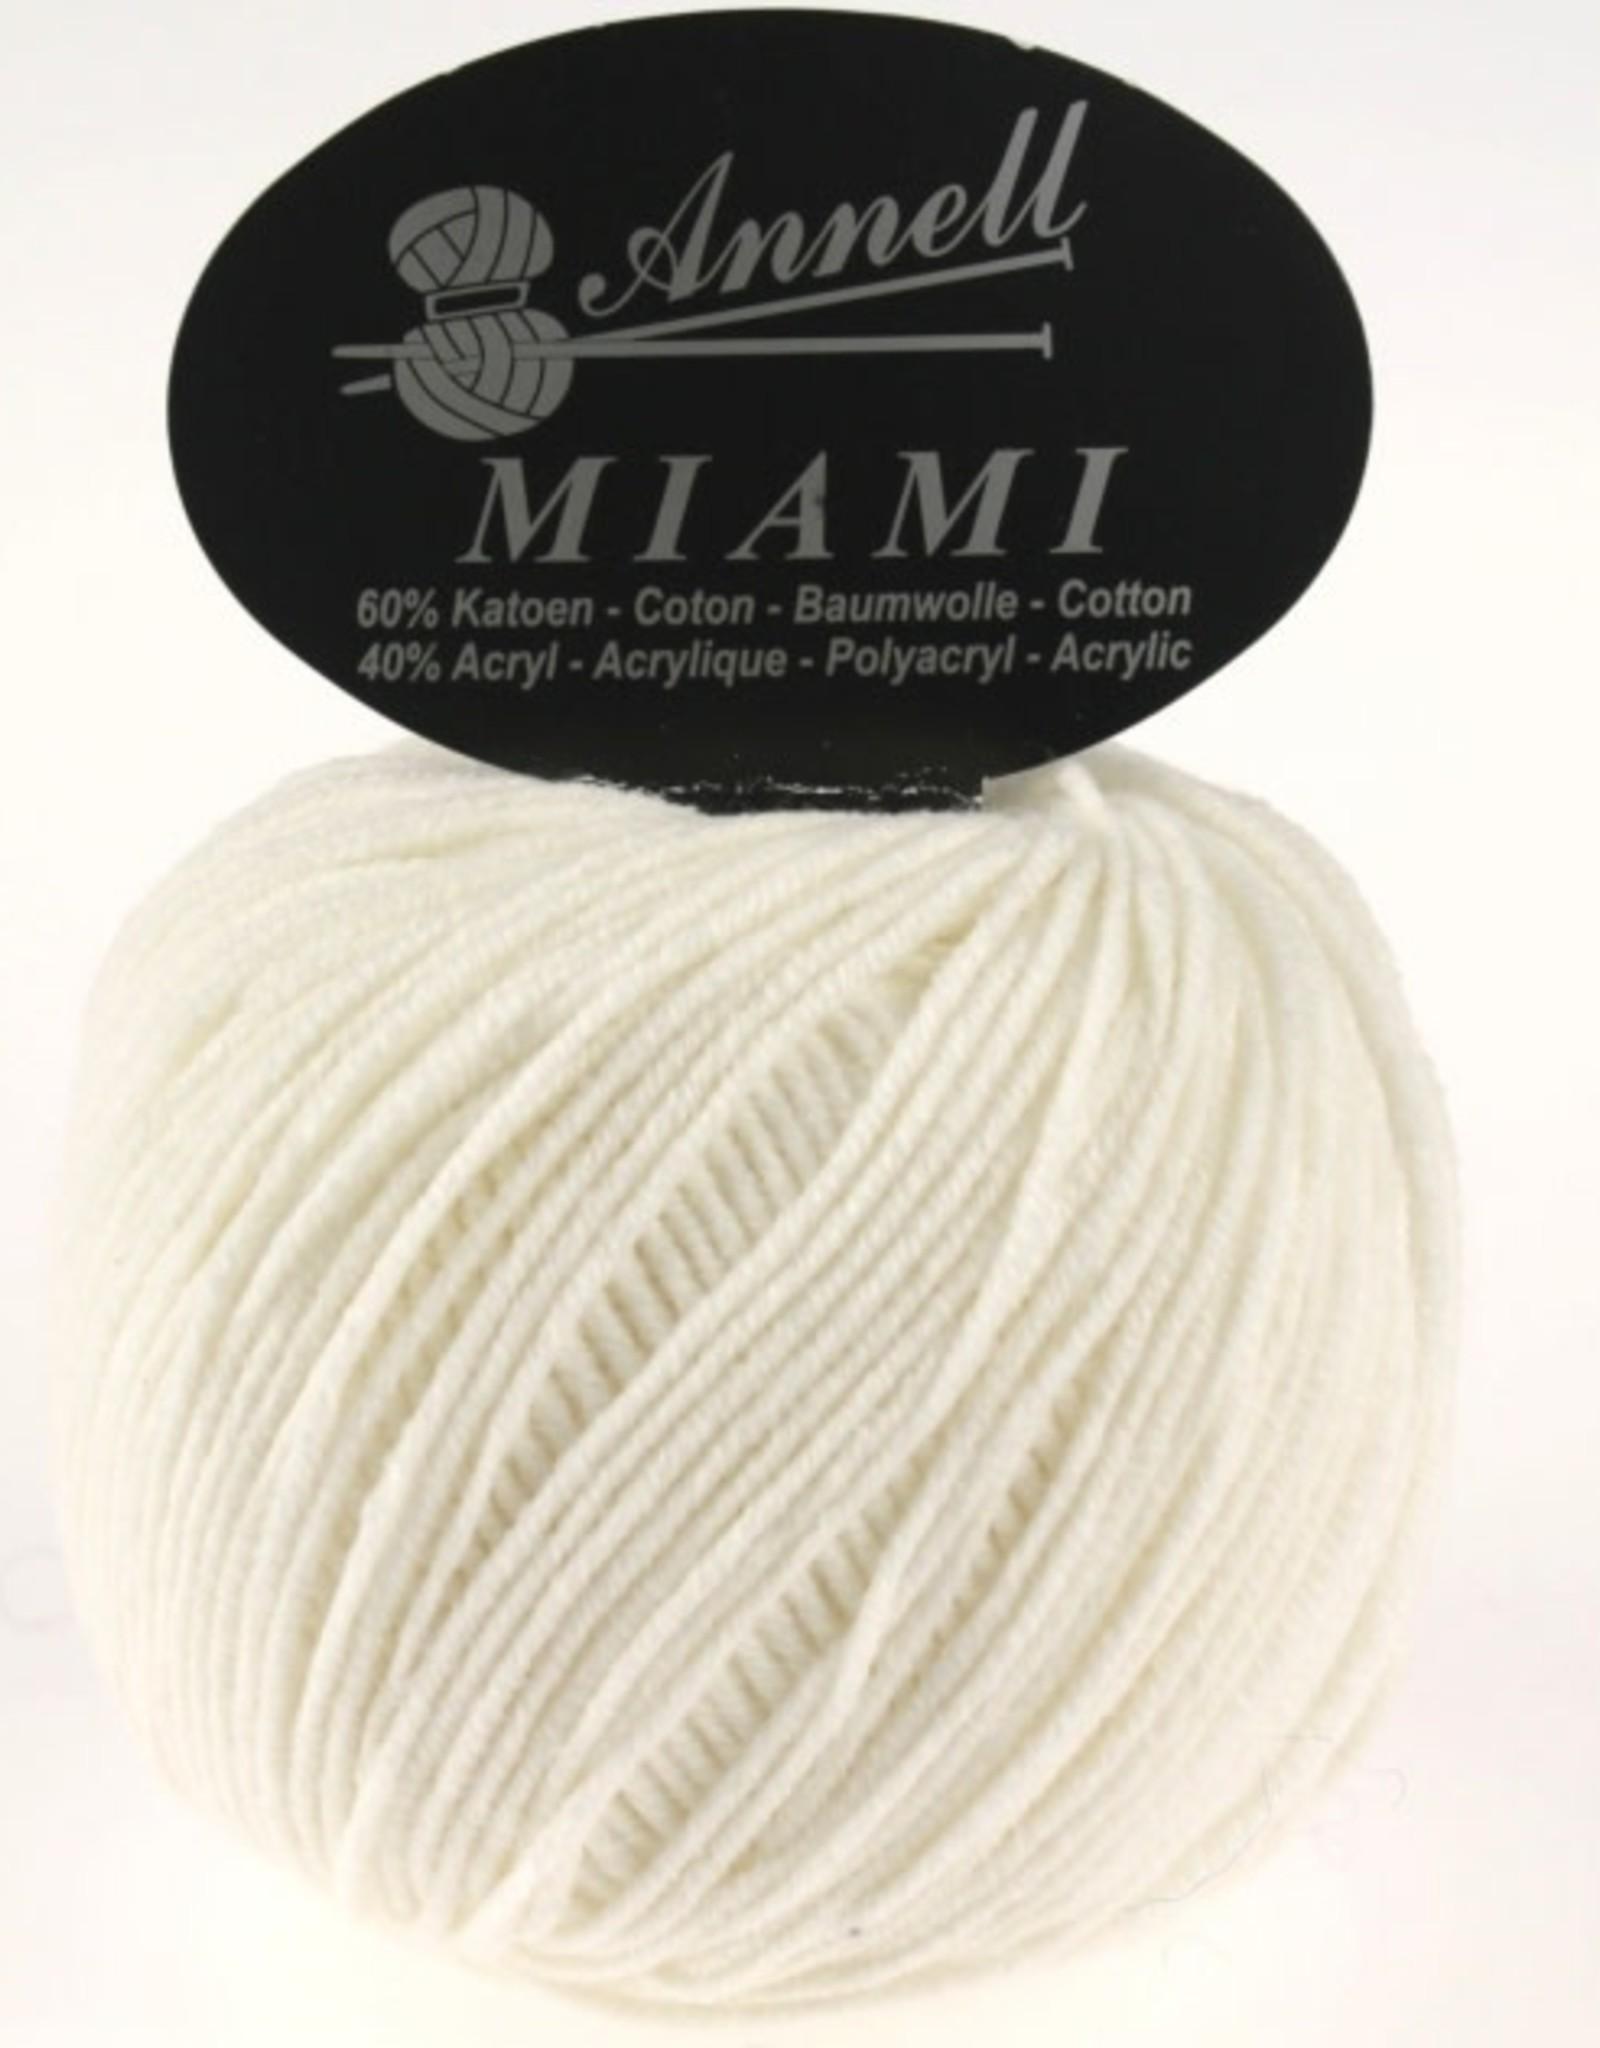 Annell Annell Miami 8960